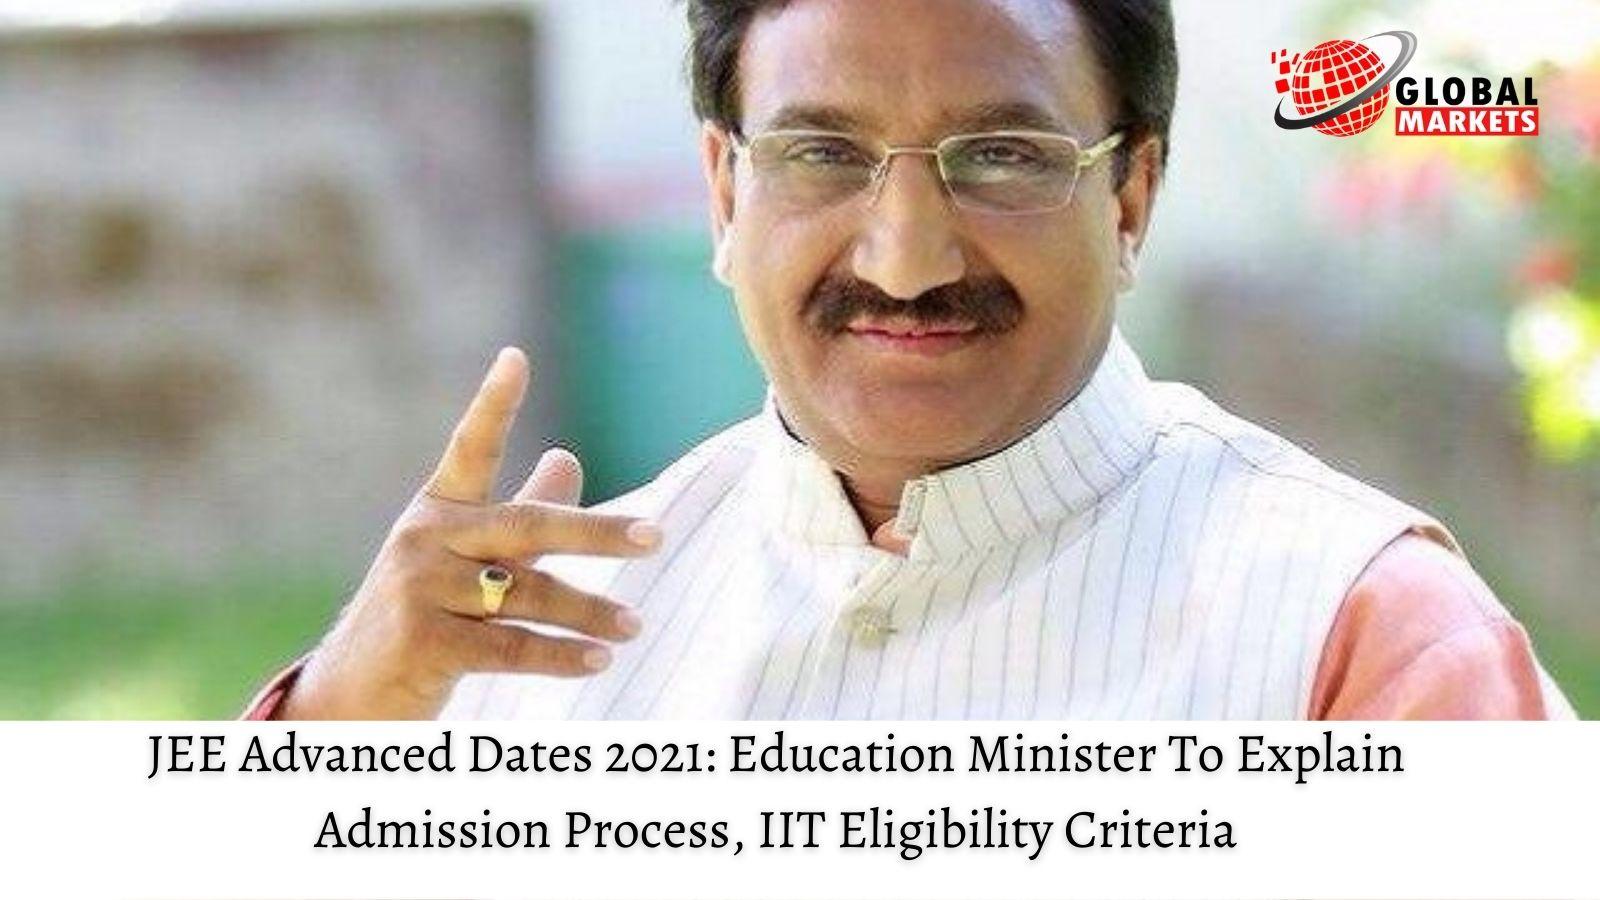 JEE Advanced Dates 2021: Education Minister To Explain Admission Process, IIT Eligibility Criteria